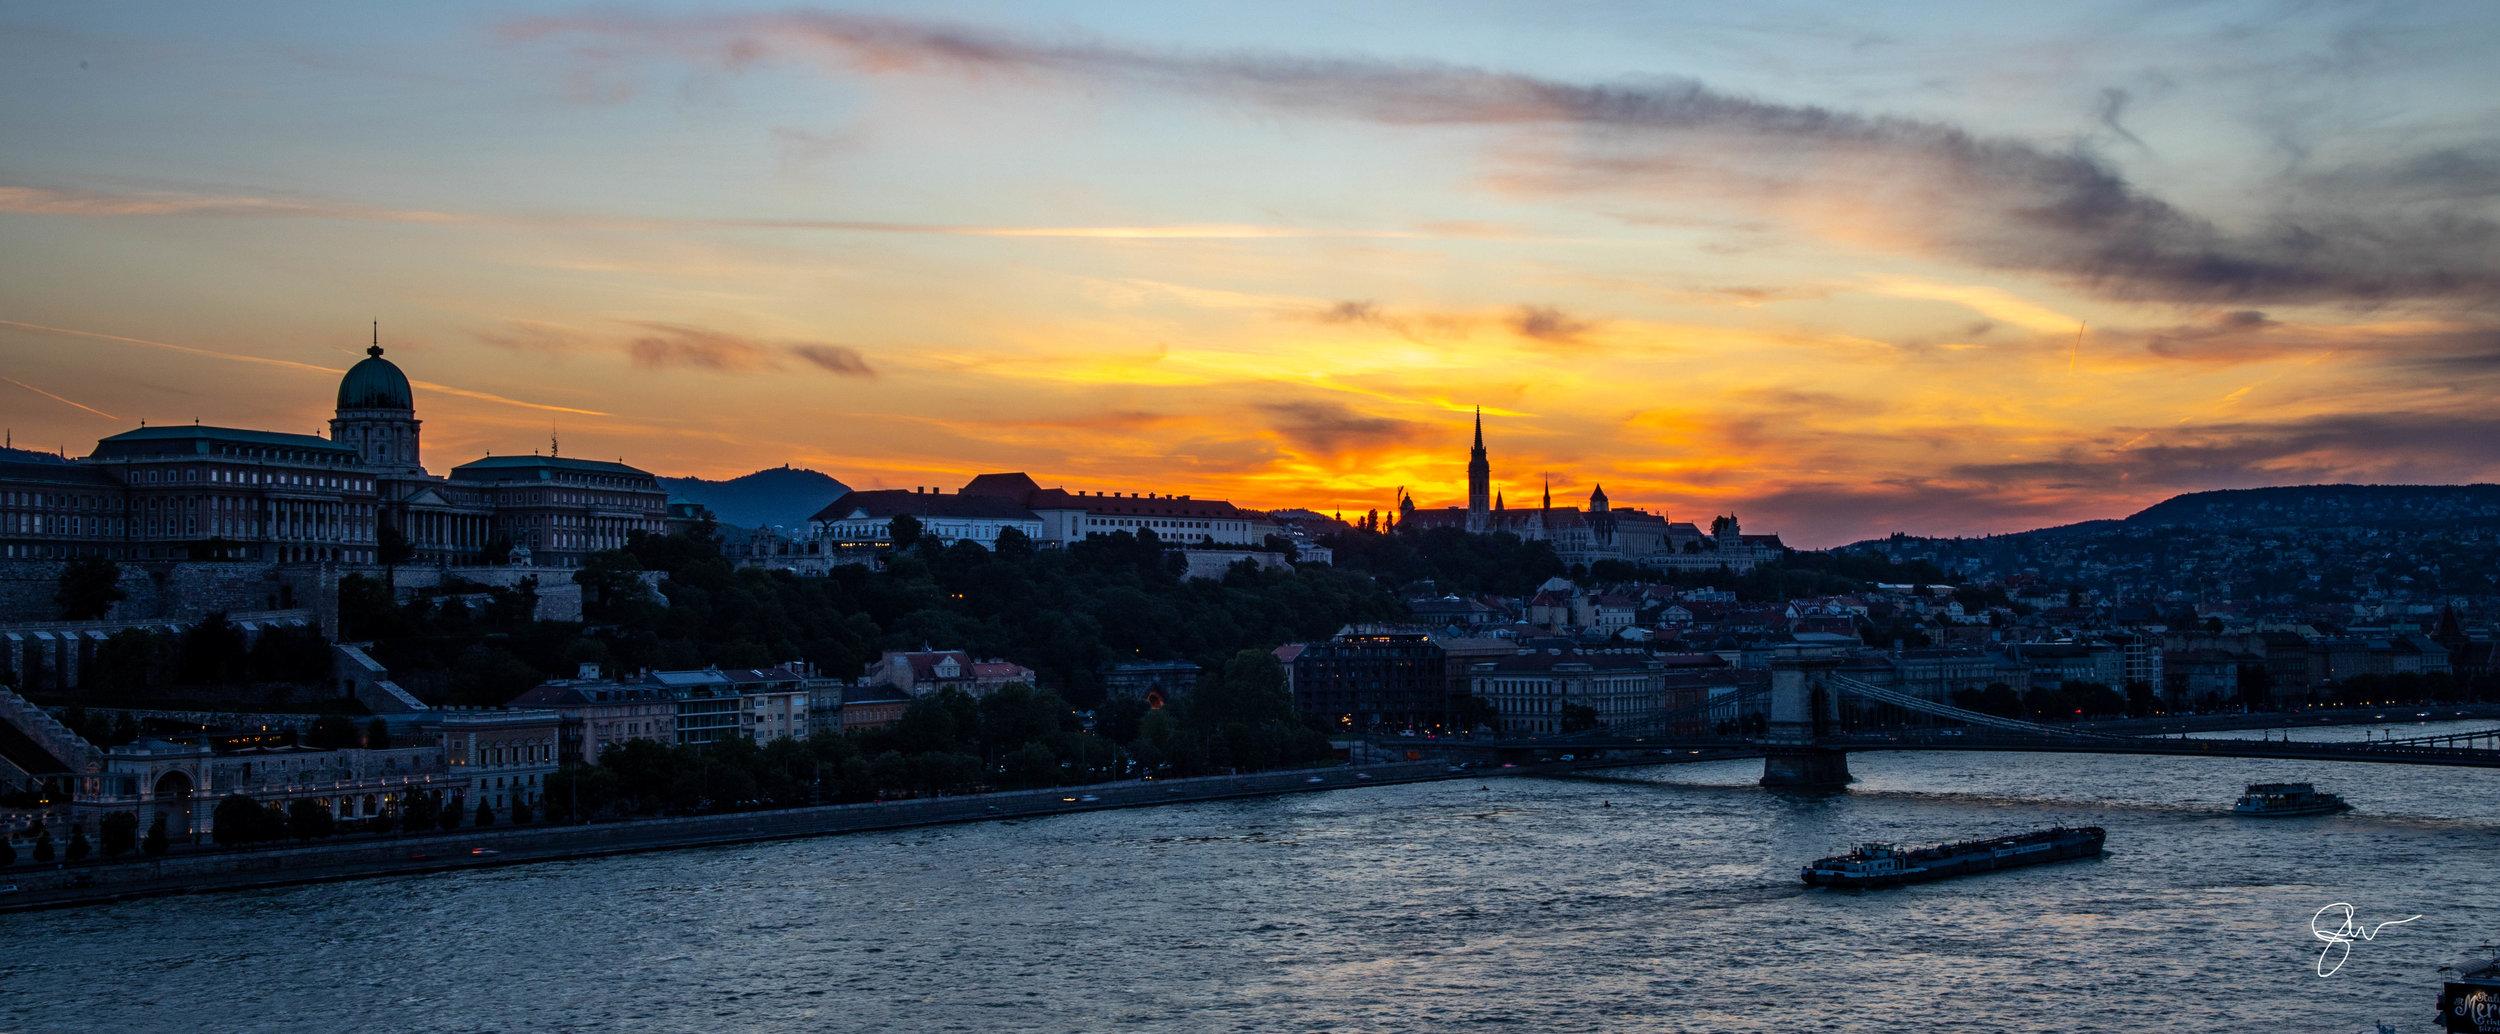 2019 Danube Cruise 5 Star-16.jpg